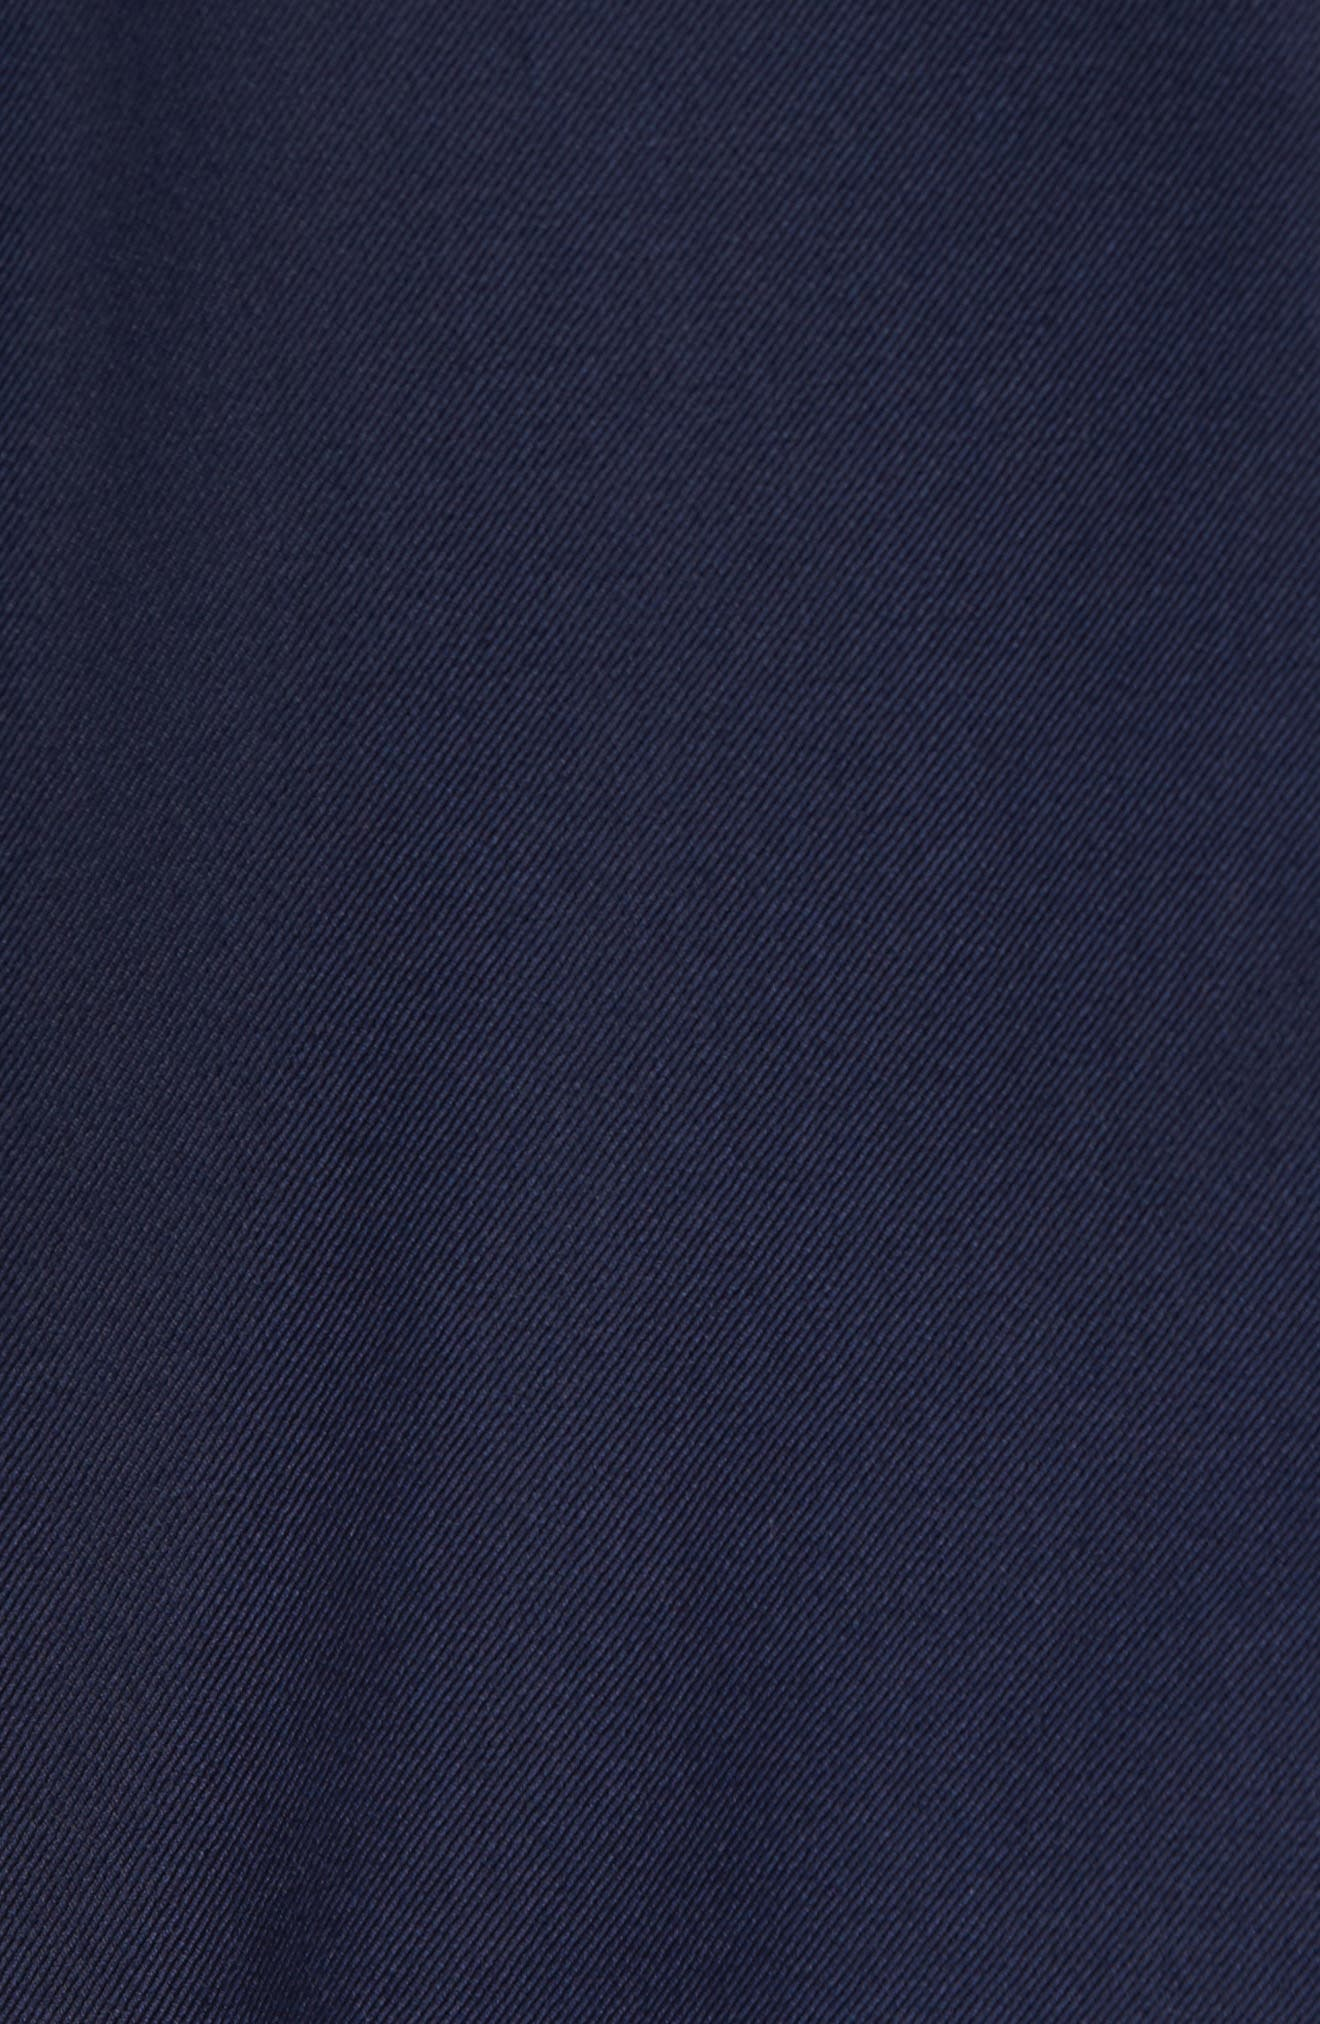 HICKEY FREEMAN, Classic B Fit Loro Piana Wool Suit, Alternate thumbnail 7, color, NAVY